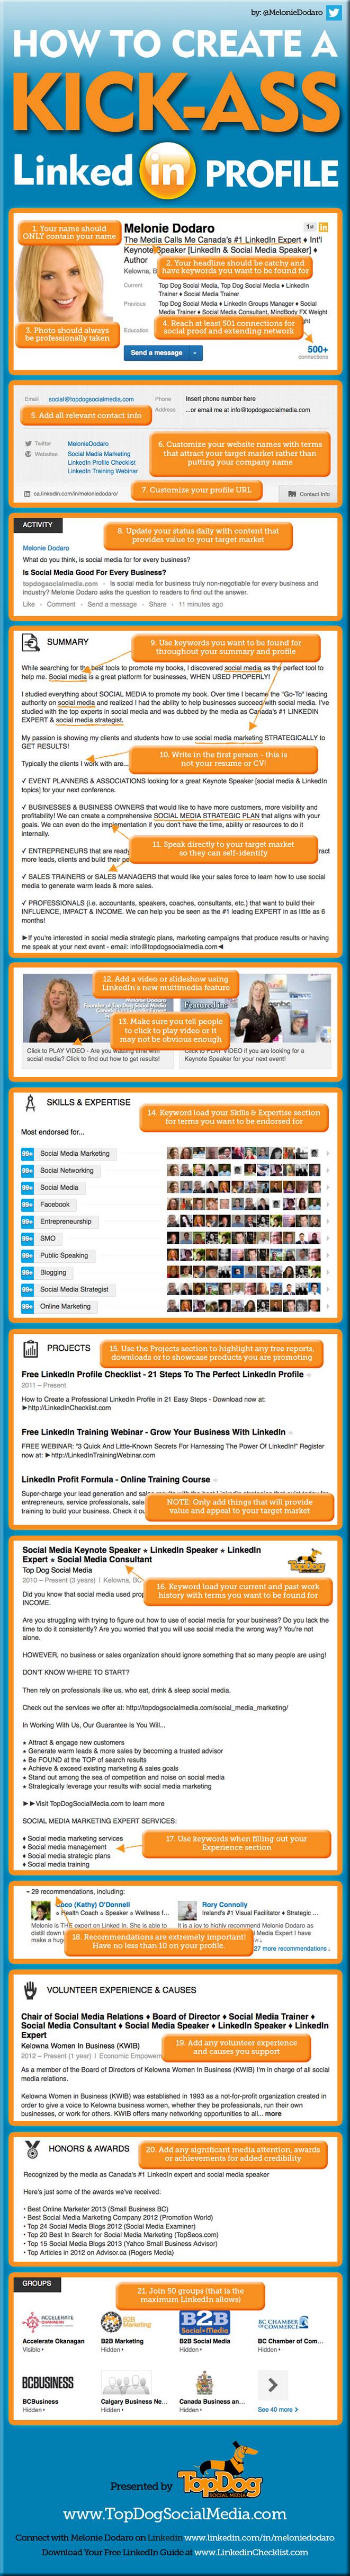 How-to-create-an-awesome-LinkedIn-Profile